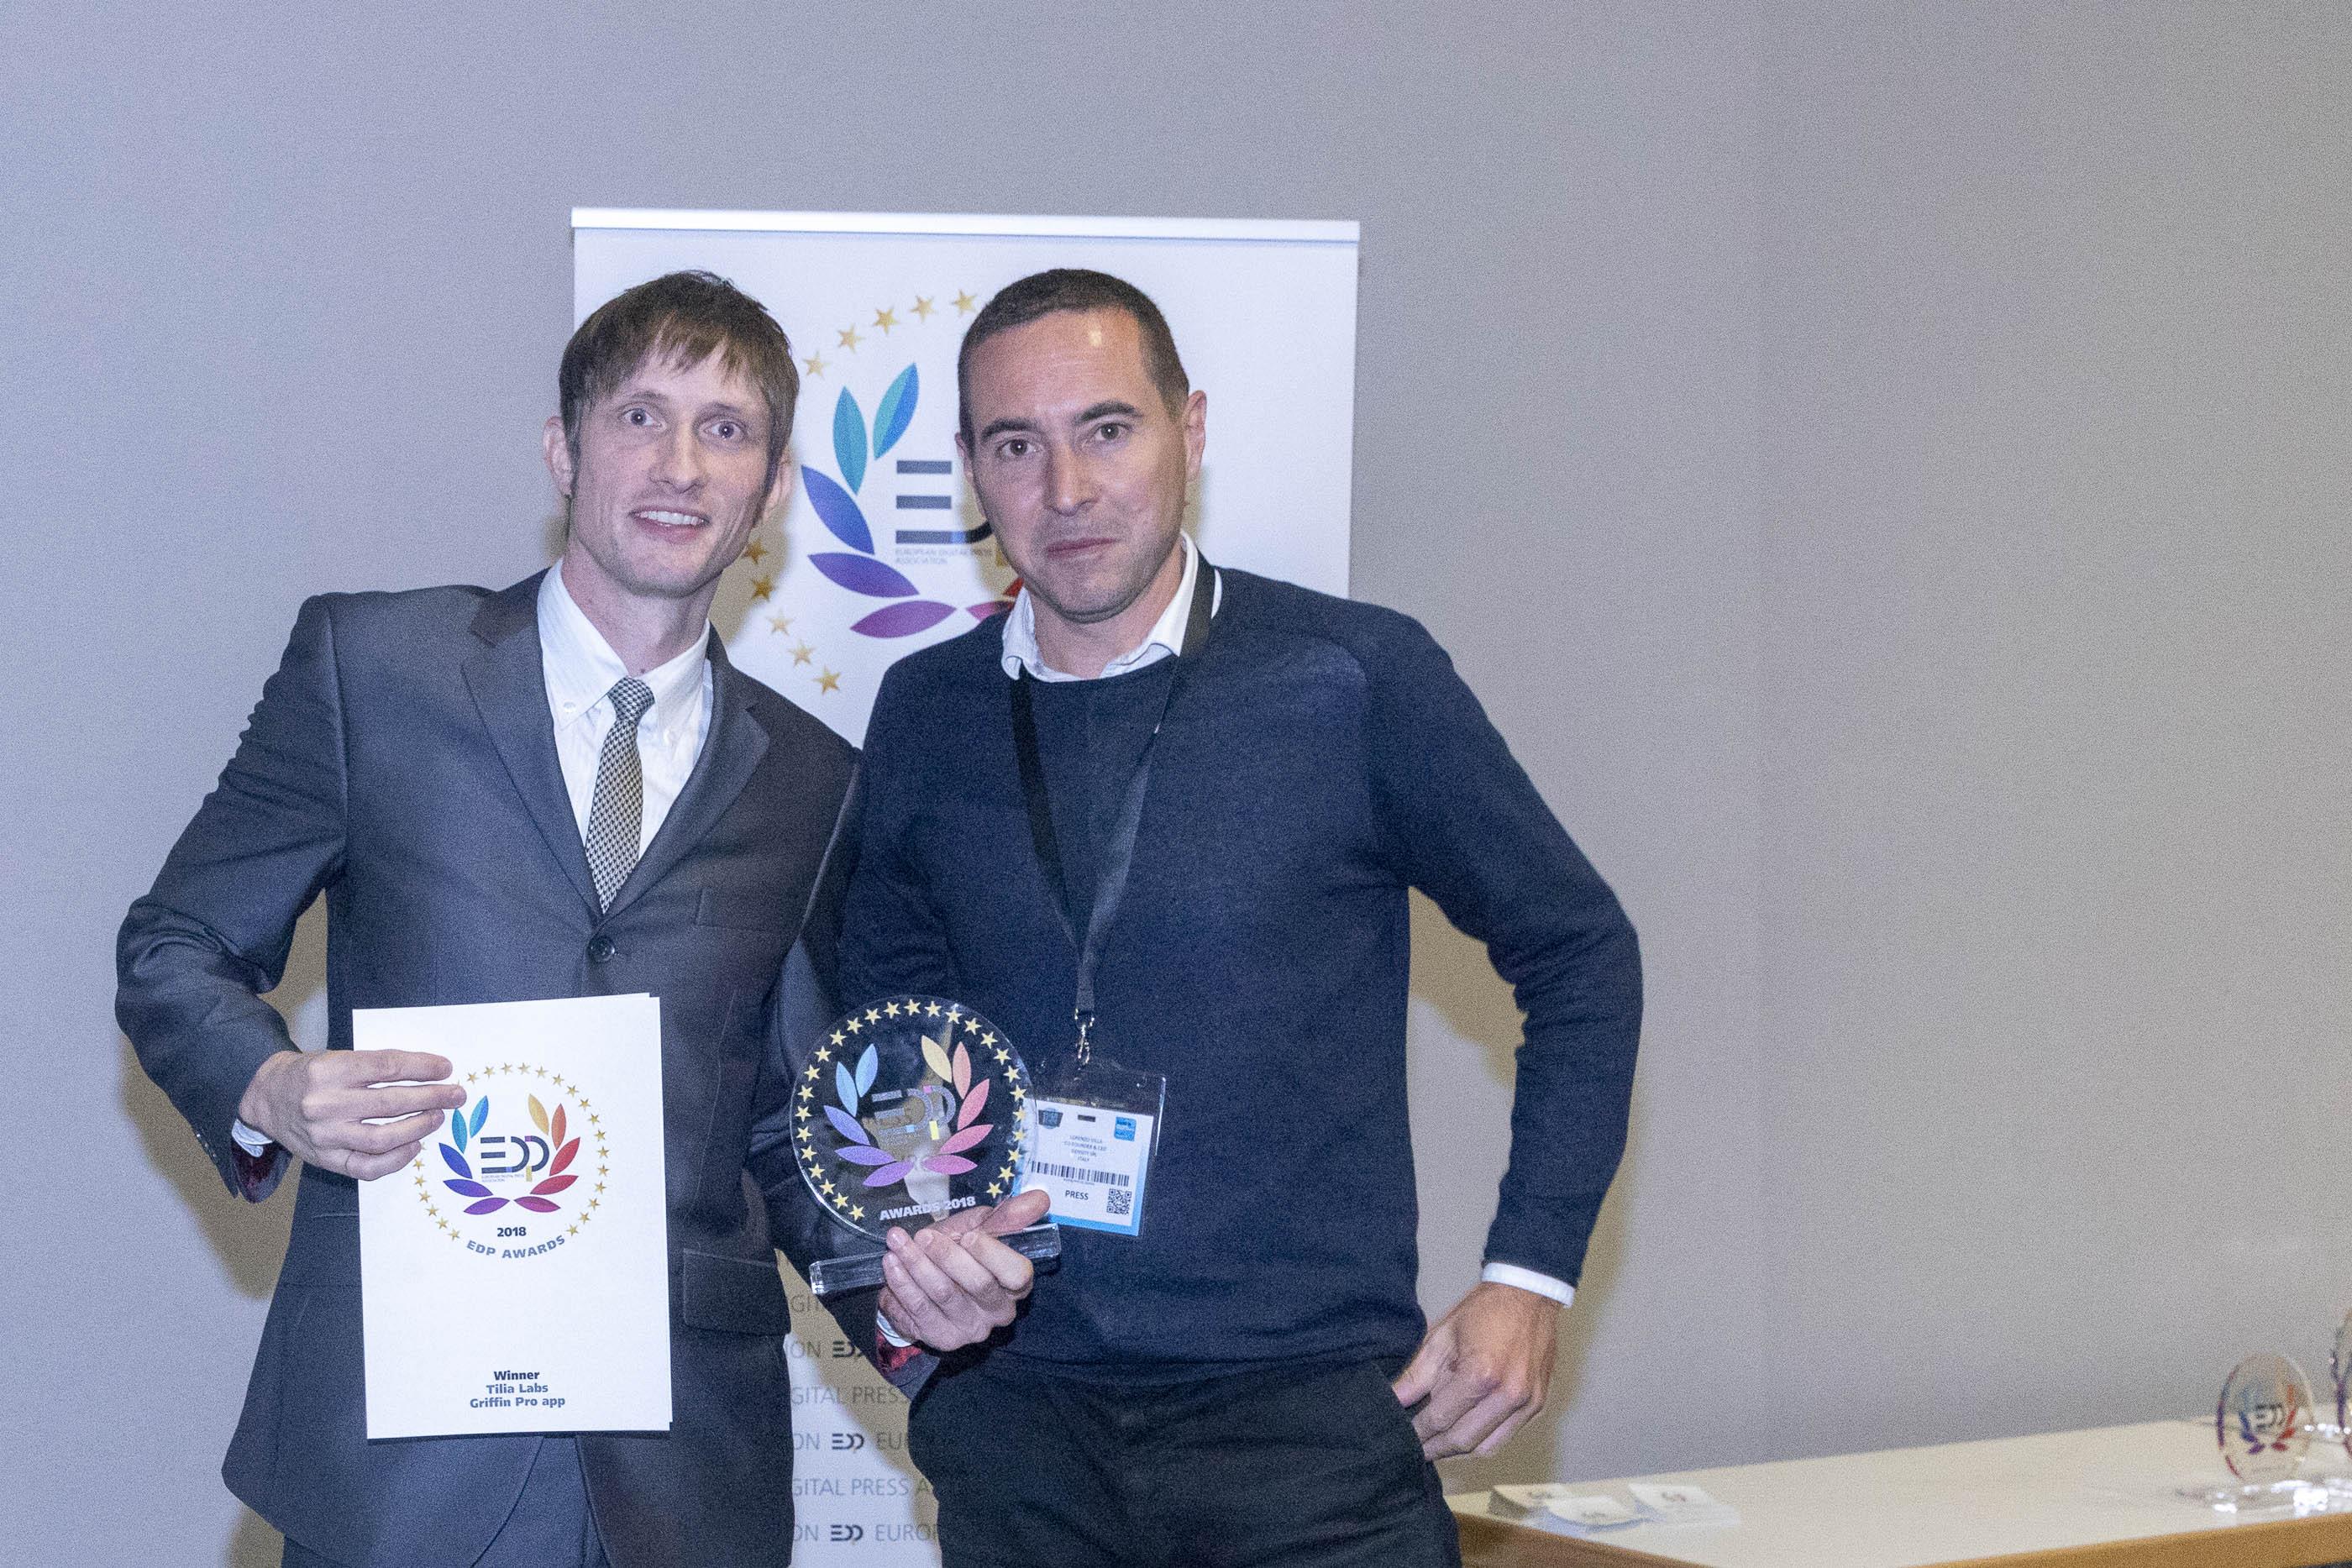 Tilia Labs Receives EDP Award For Griffin Pro App For Optimising